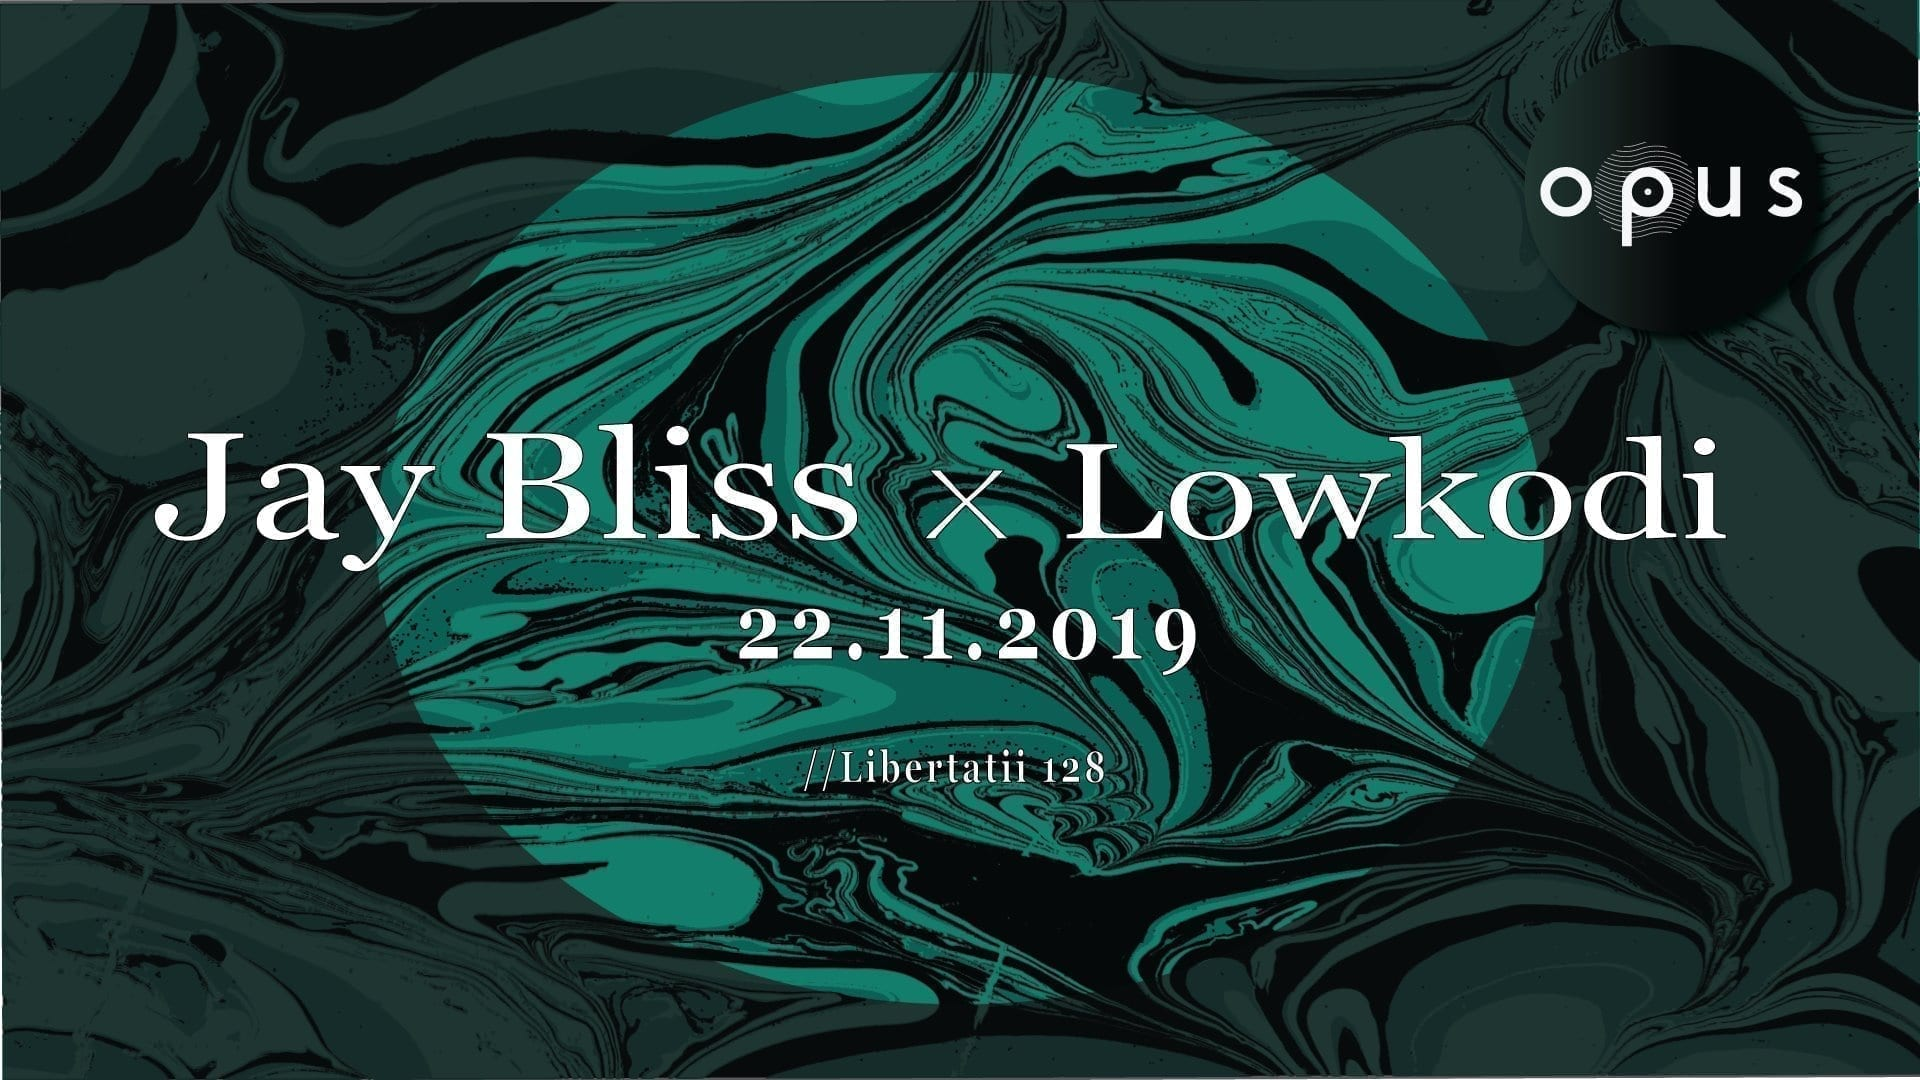 Opus presents Jay Bliss x Lowkodi